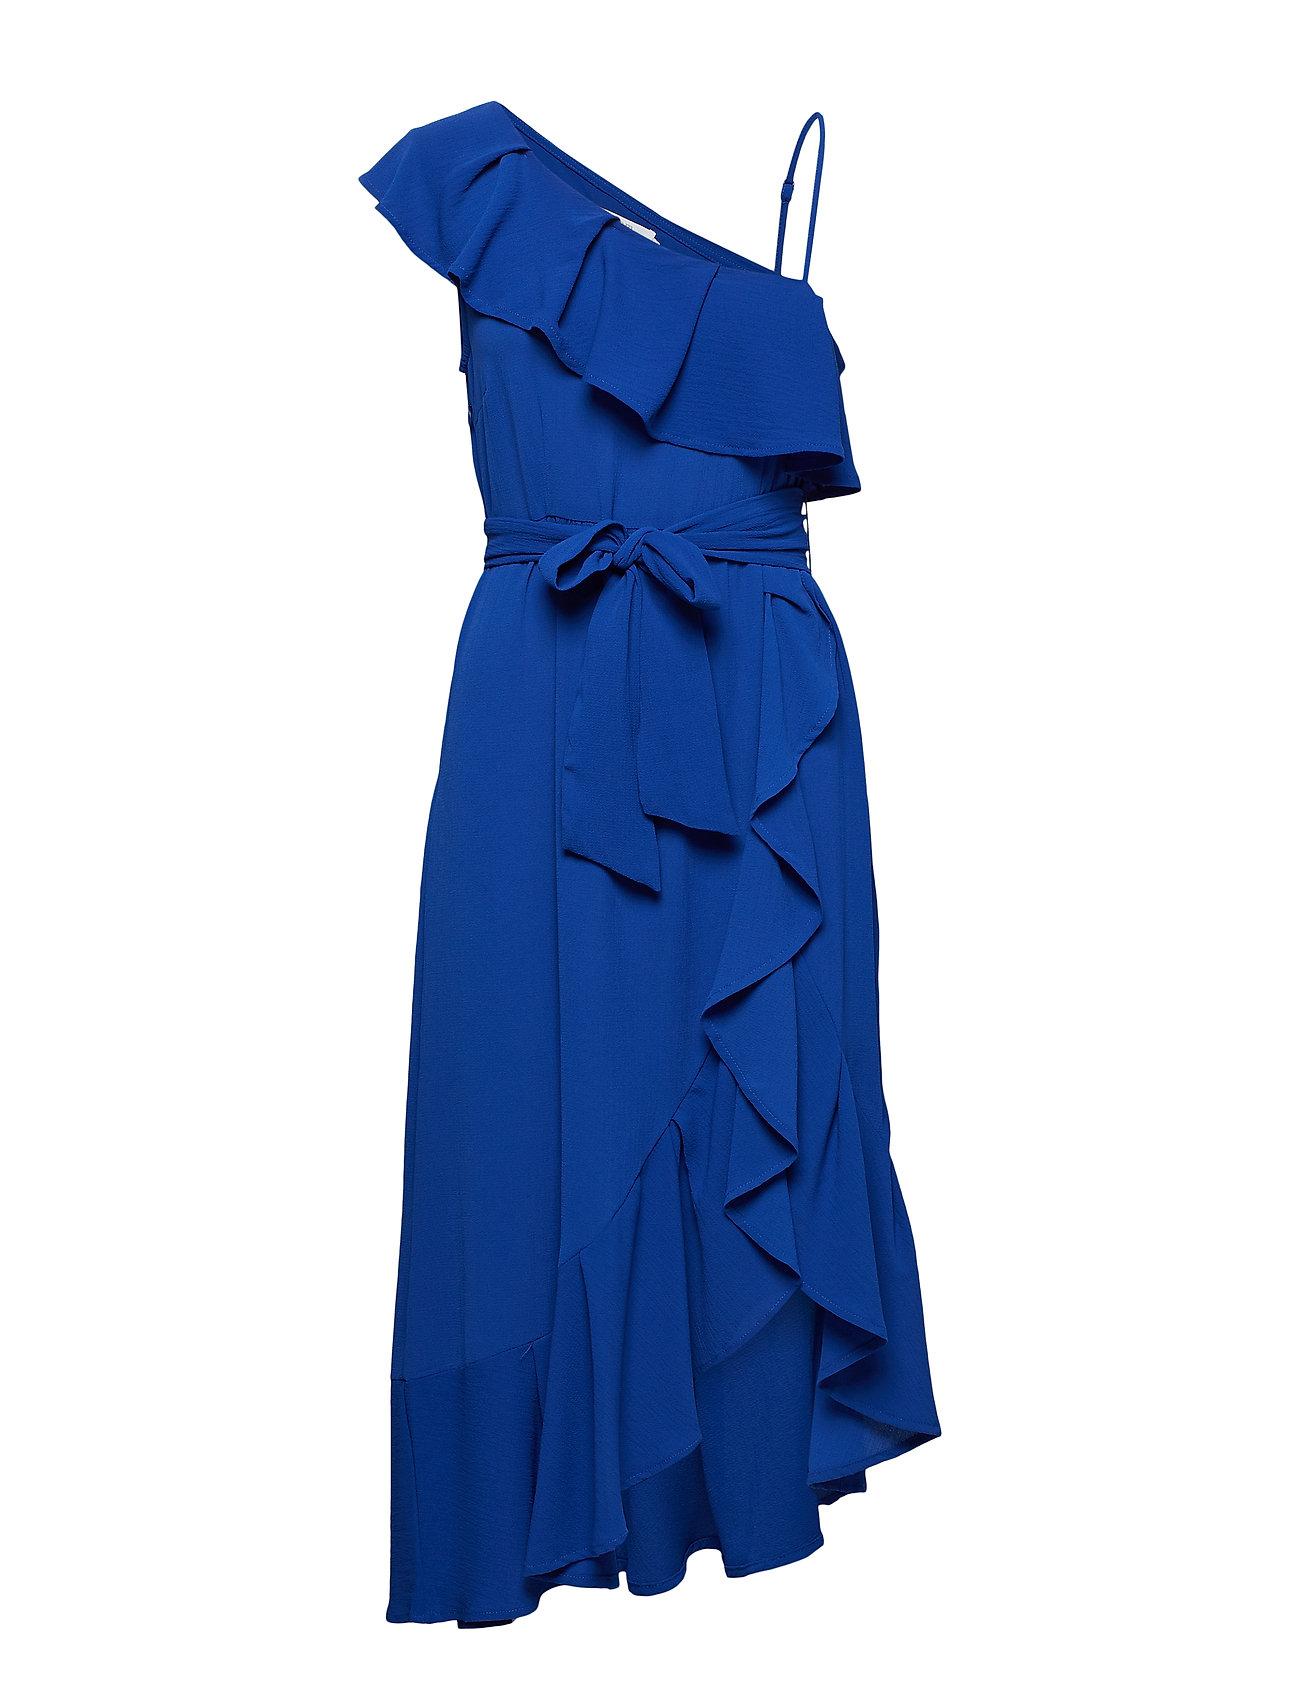 Cream Cabrilla Dress - LIMOGES BLUE